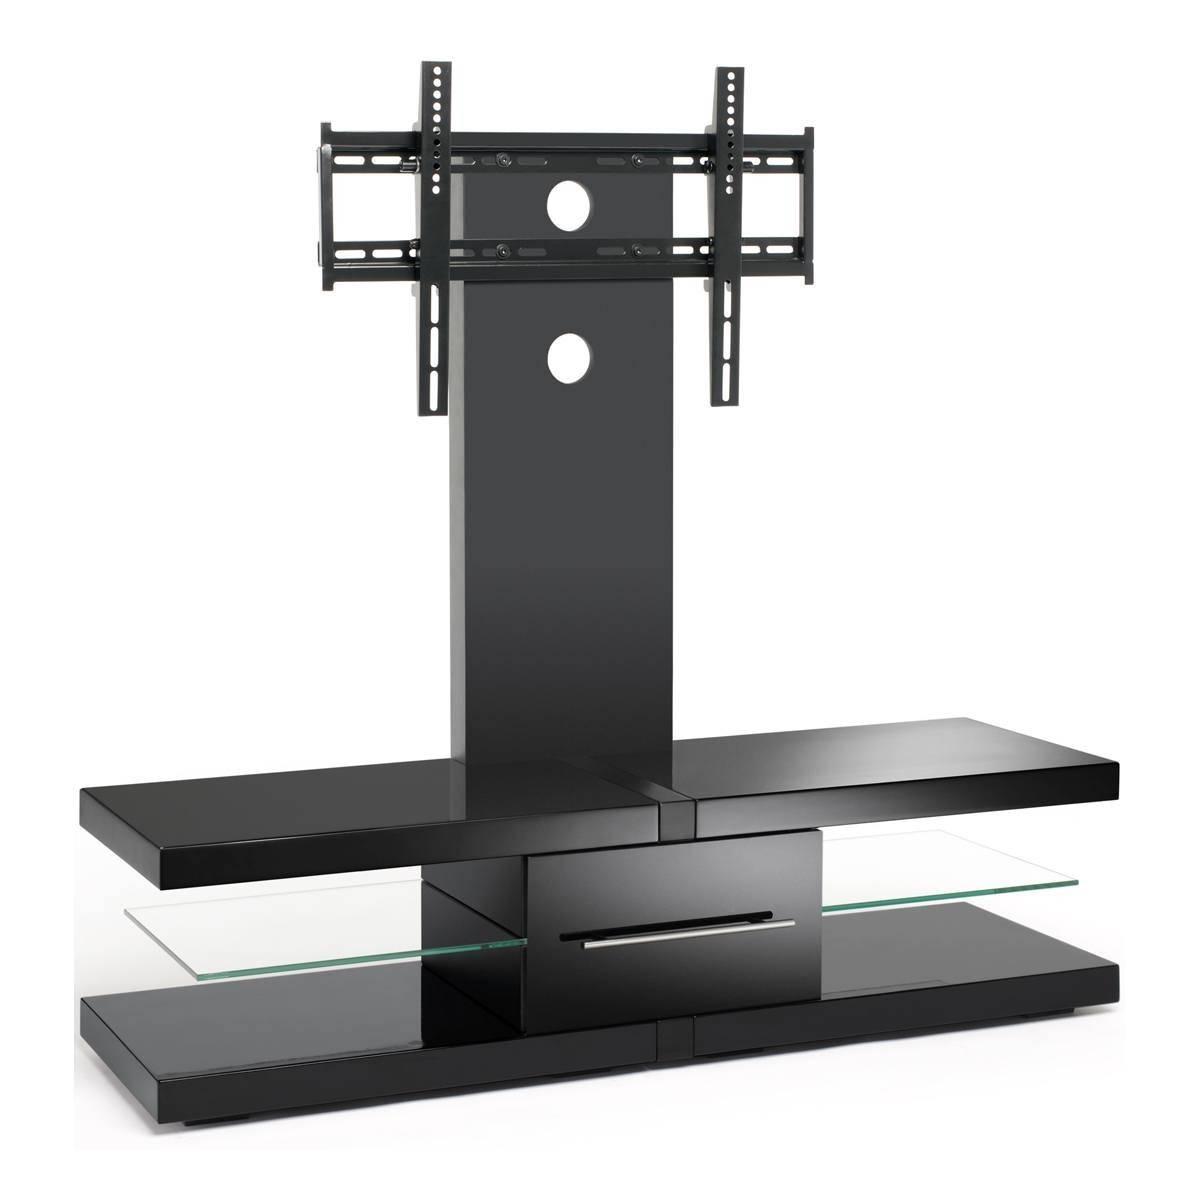 "Tech Link Echo-Ec130Tvb Av Rack For Up To 60"" Tv Screens | Hughes throughout Techlink Tv Stands (Image 11 of 15)"